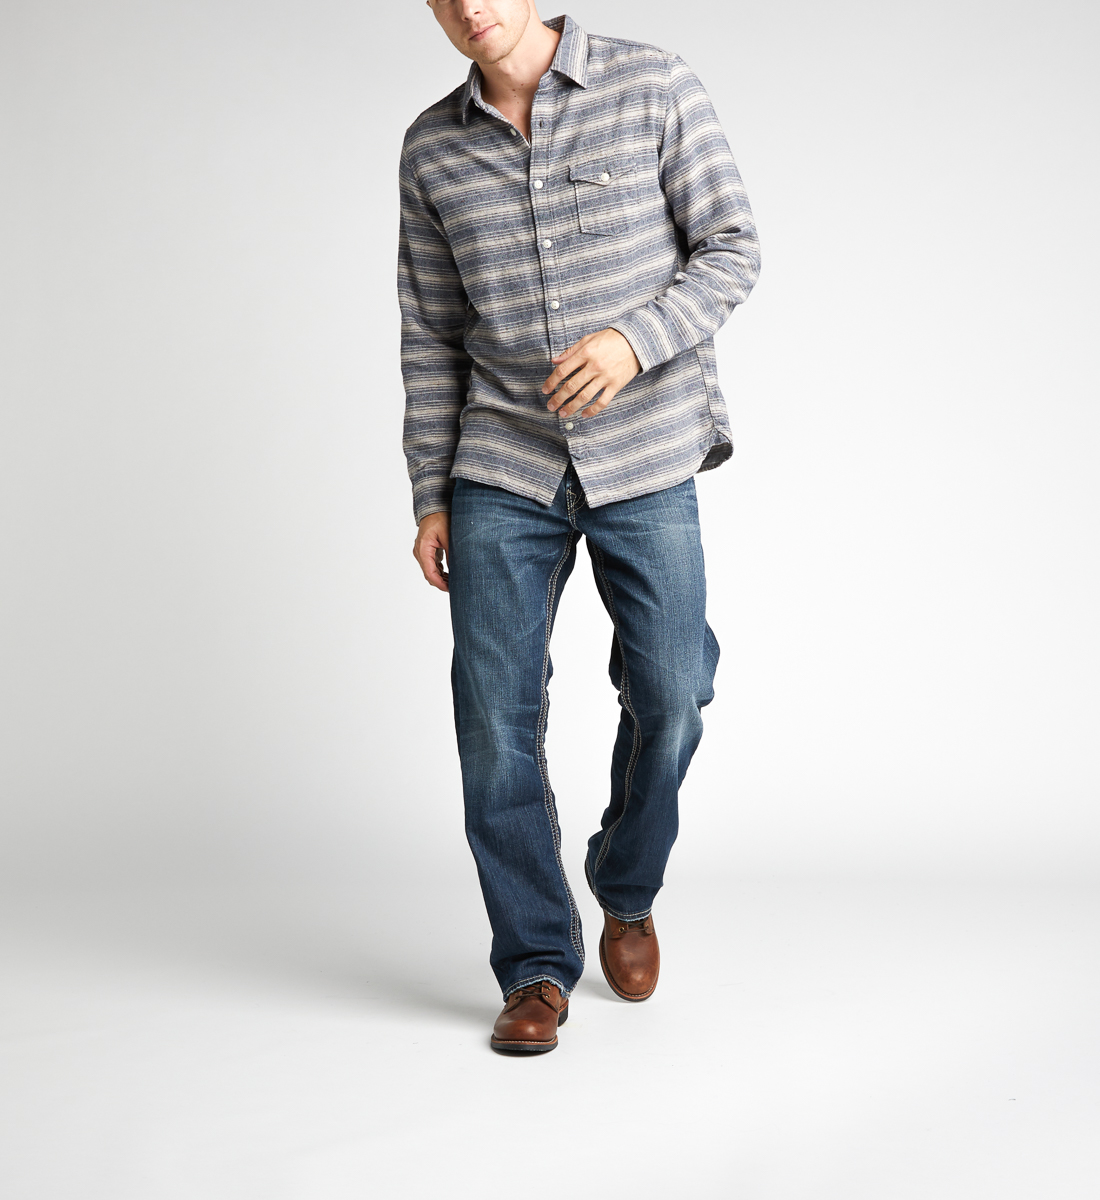 Silver Jeans Gordie Loose Fit Straight Leg Jeans